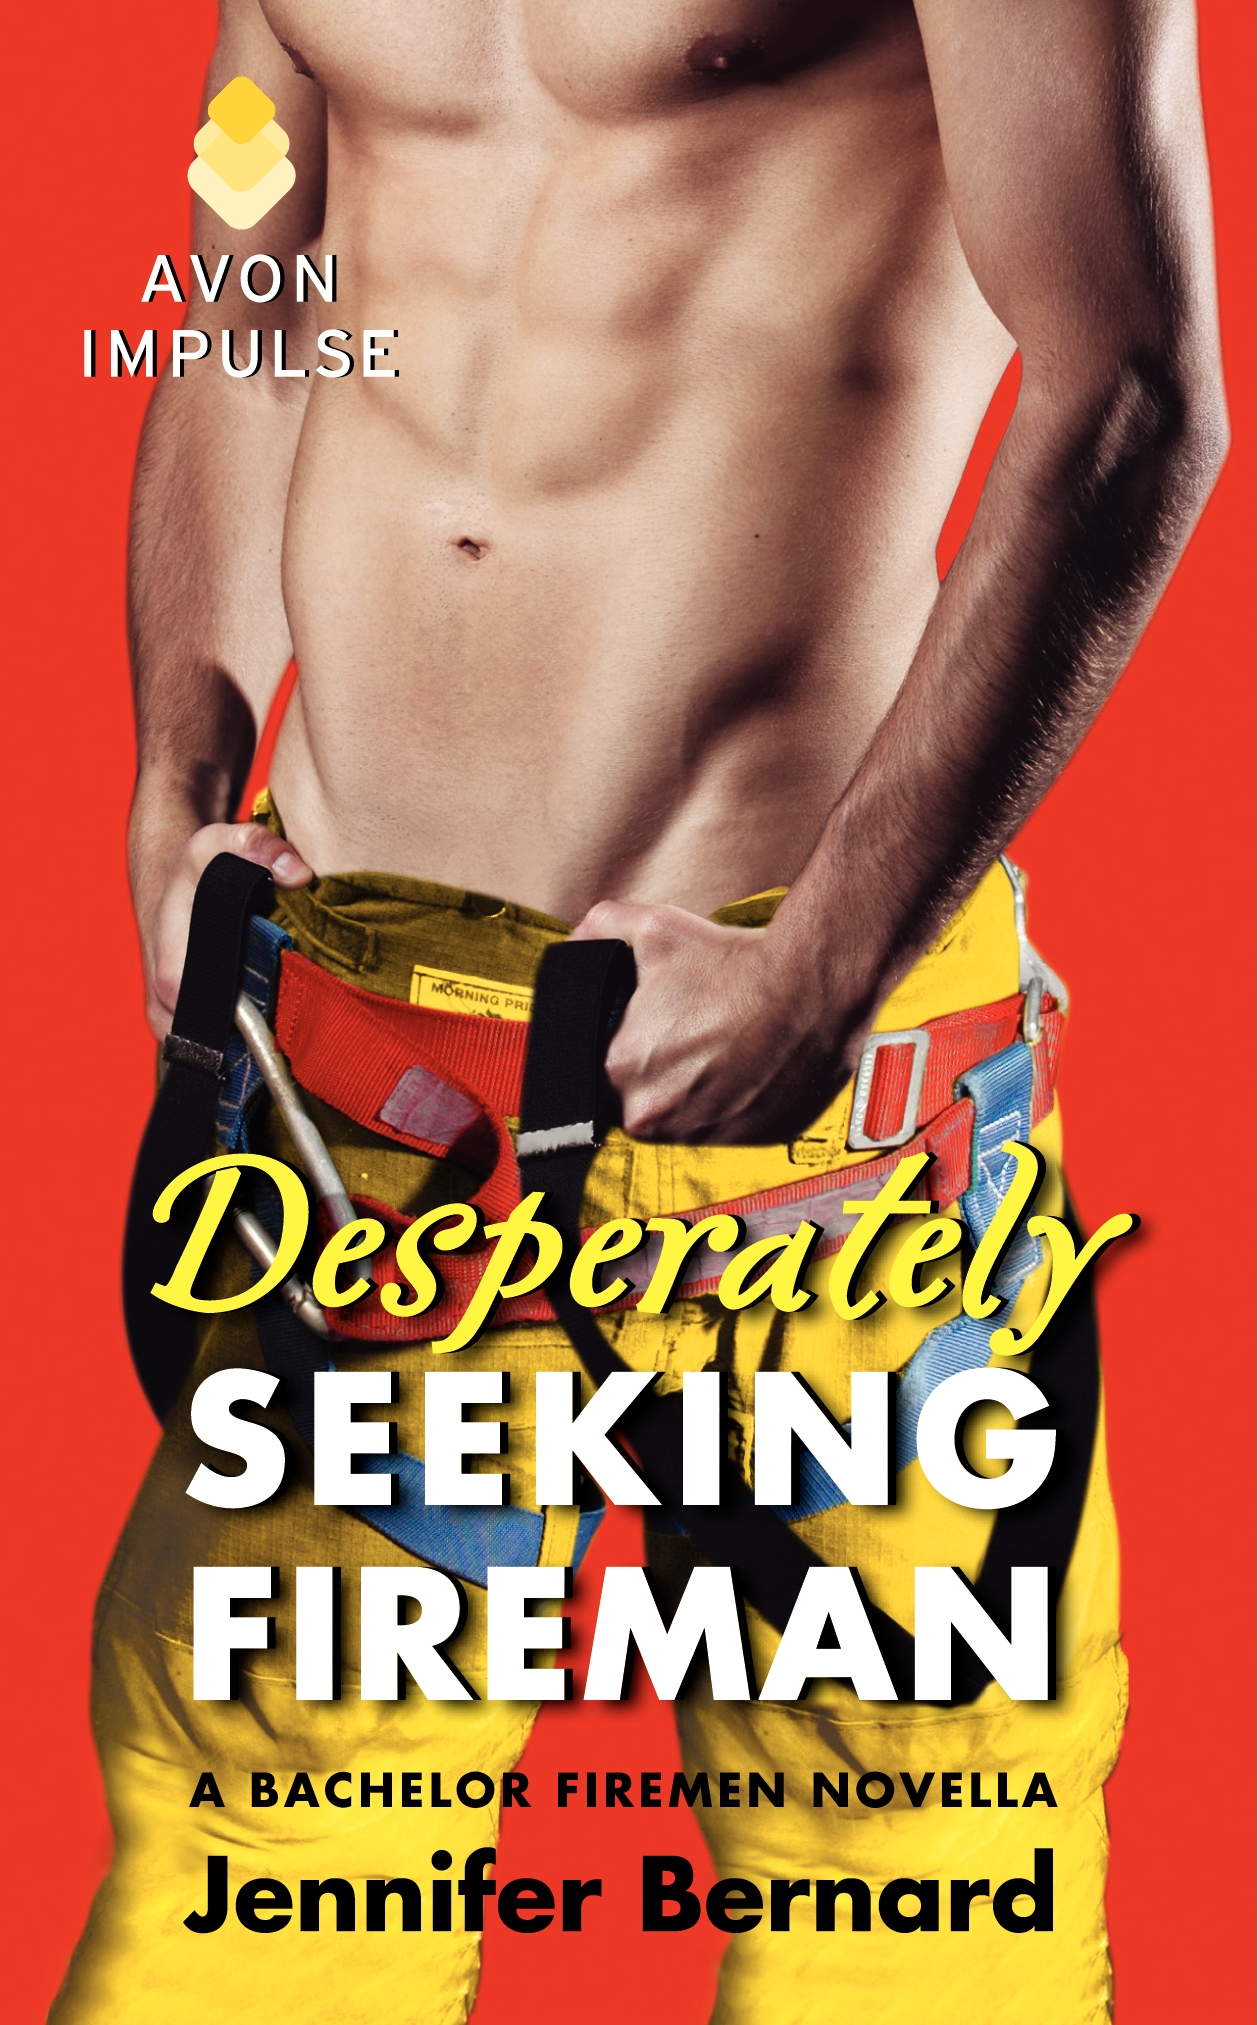 Jennifer Bernard The Bachelor Firemen of San Gabriel Desperately Seeking Fireman 4.5.jpg